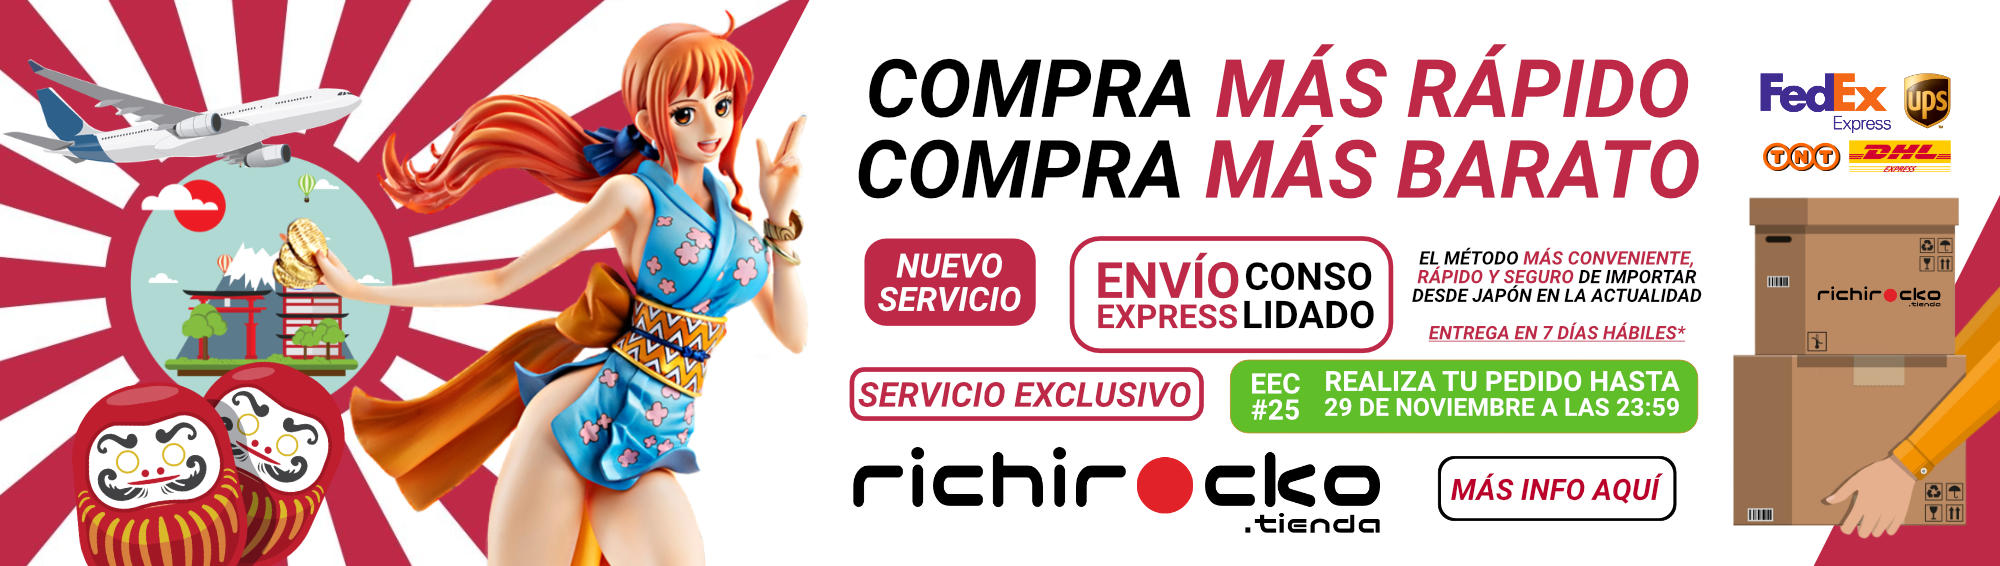 Tienda Figuras Anime Chile Envío Express